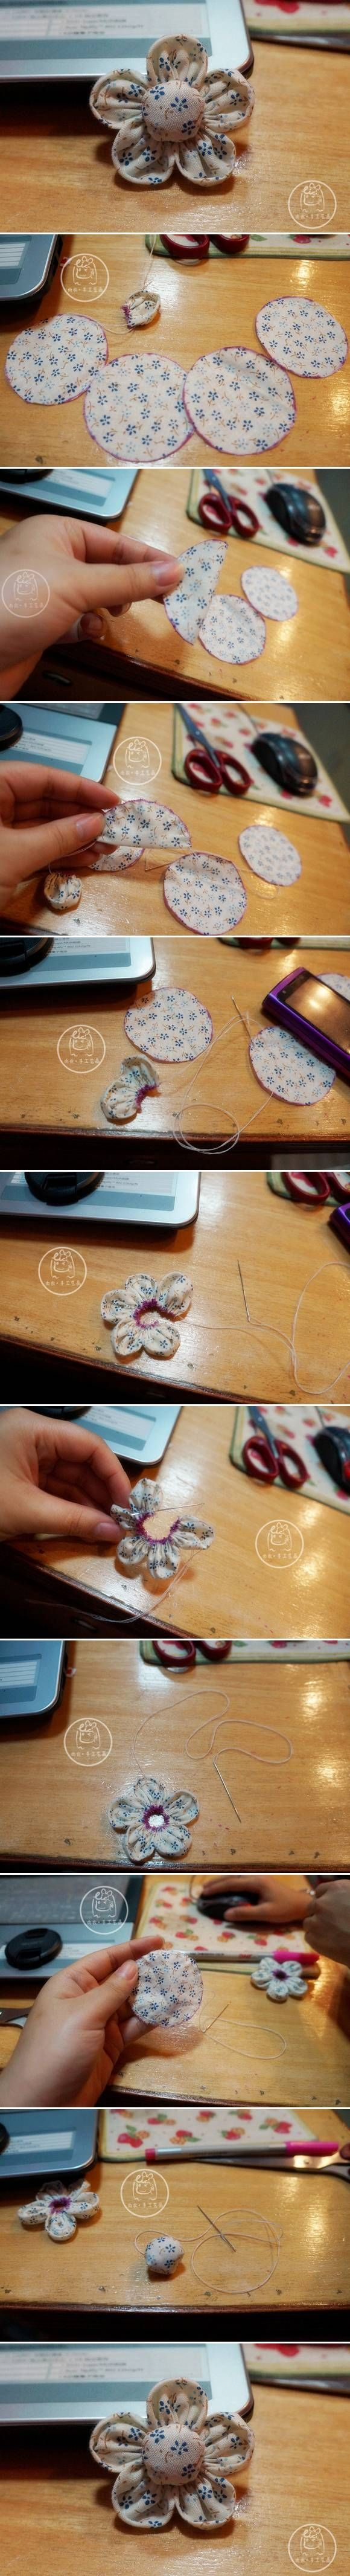 DIY Quick Handmade Fabric Flower DIY Quick Handmade Fabric Flower by diyforever